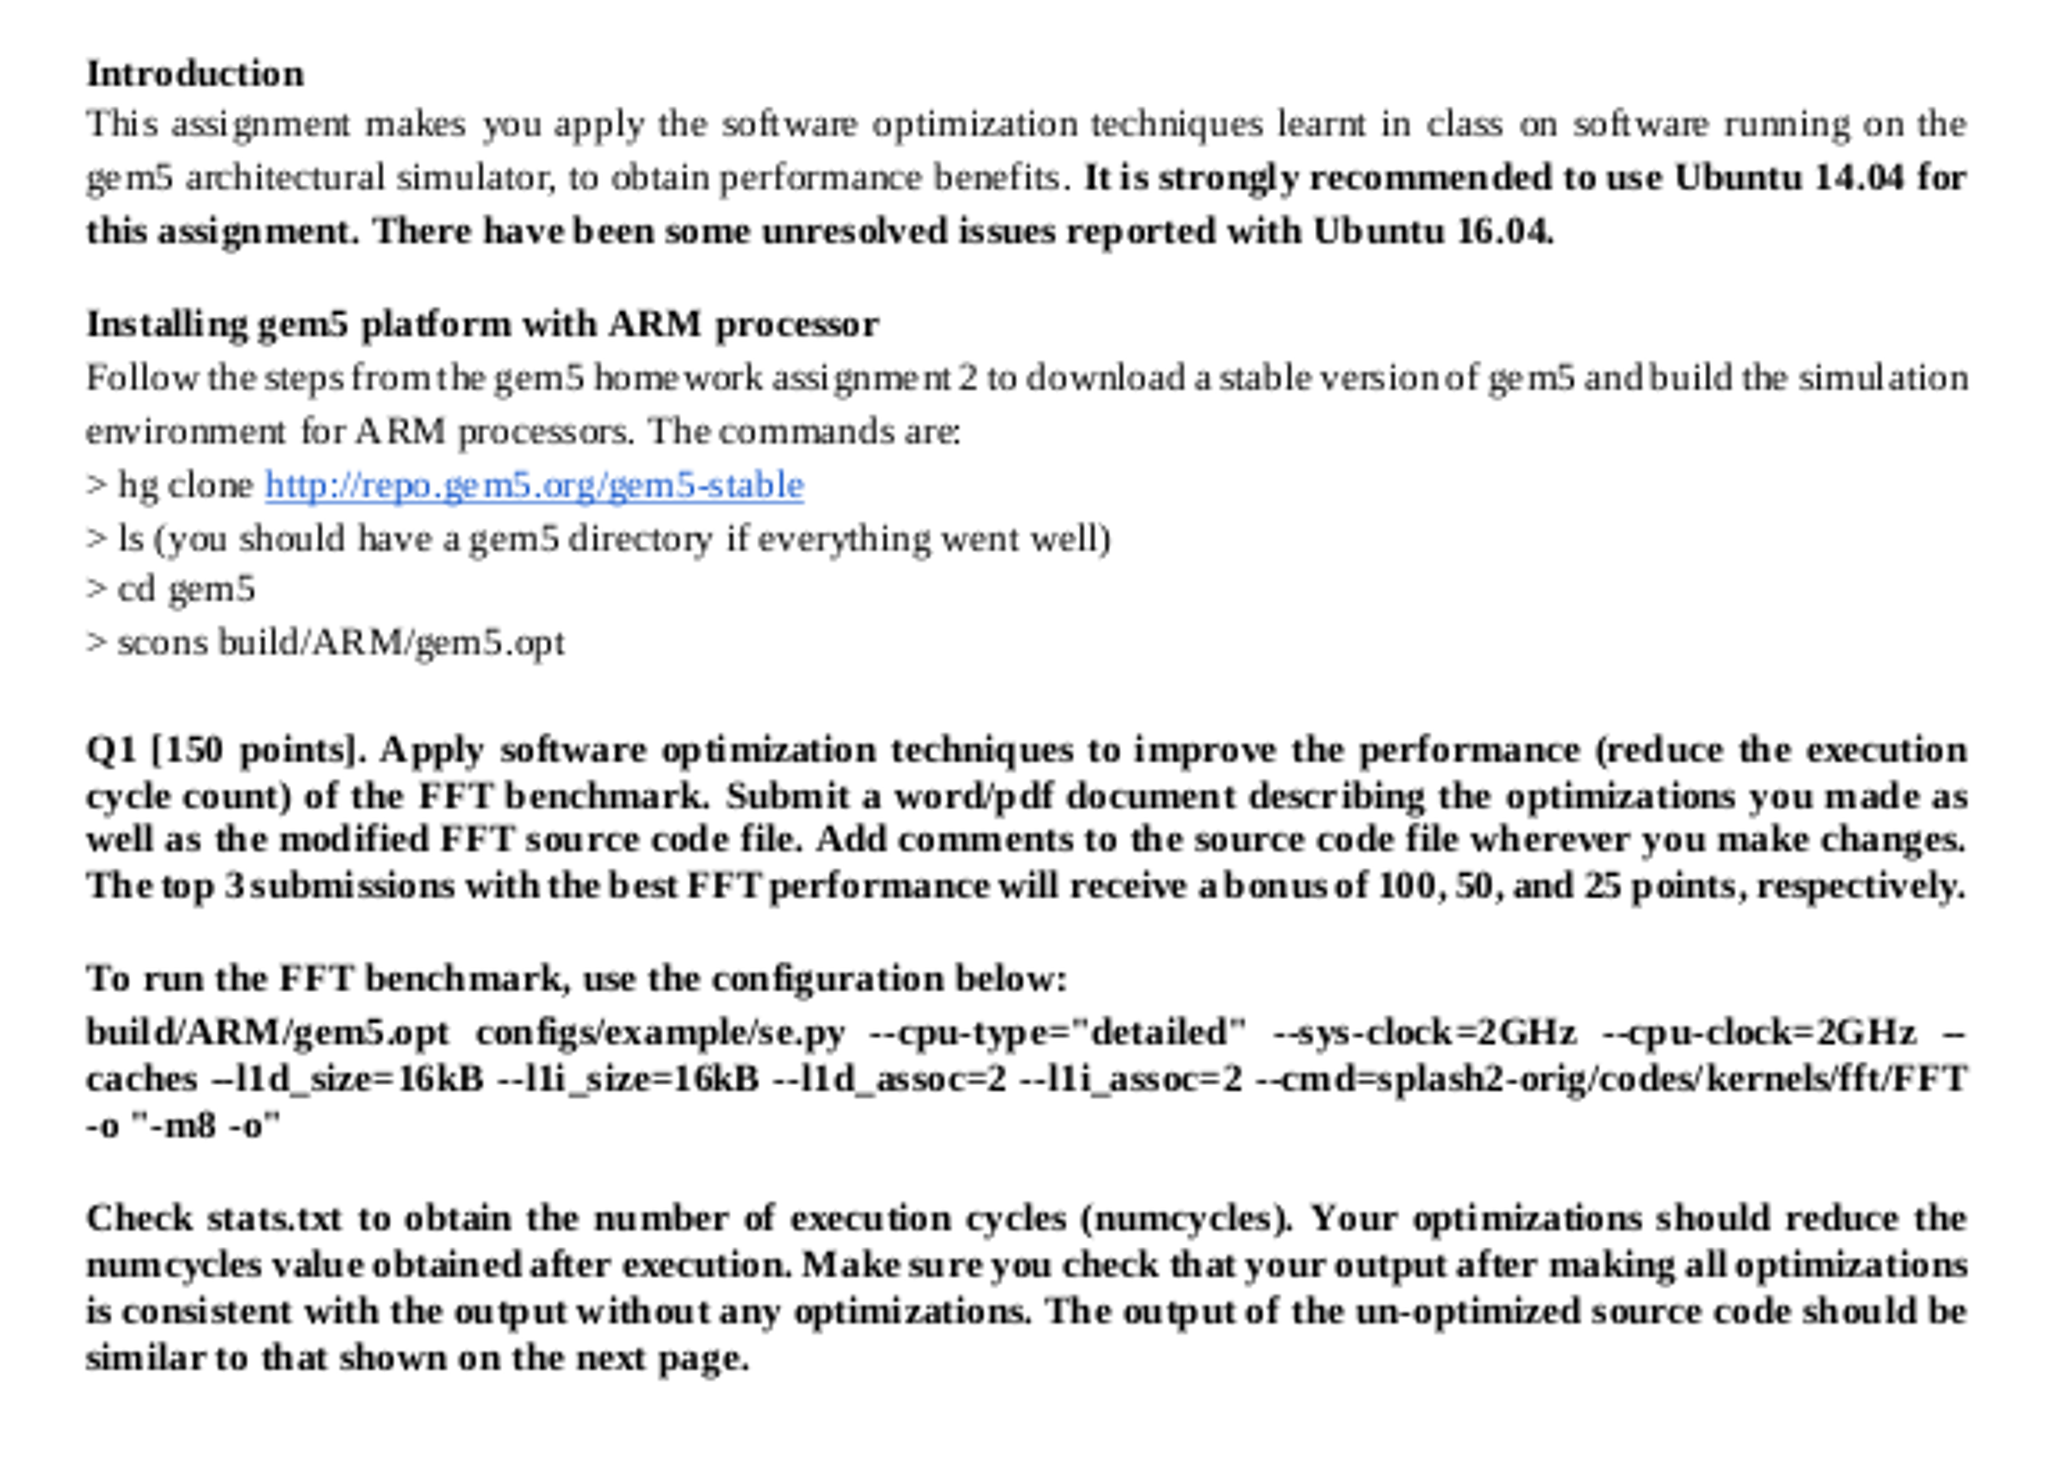 NOTE: Will Need Ubuntu To Install/run Gem5, So If